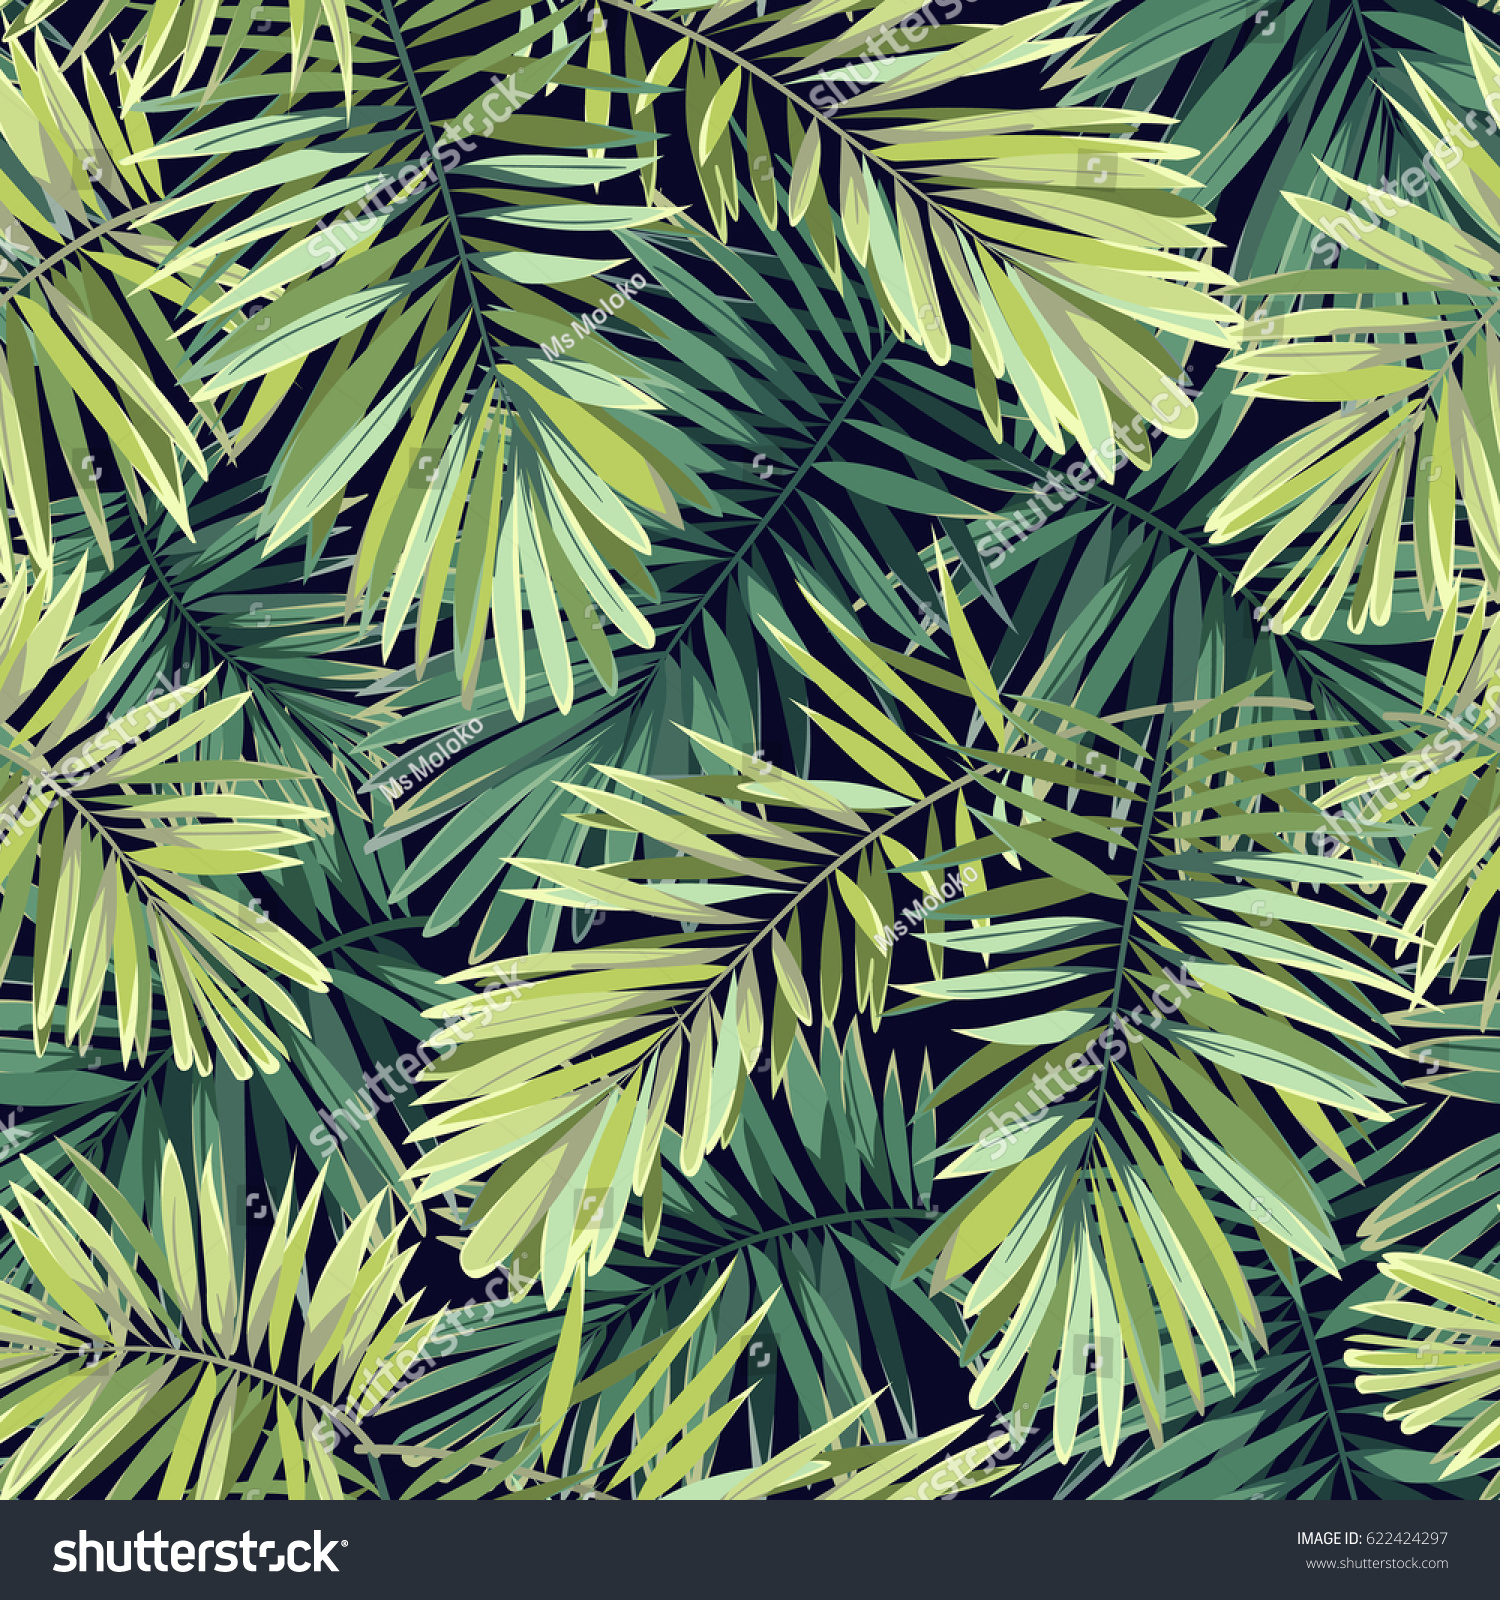 Ilustracoes Stock Imagens E Vetores De Bright Green Background Tropical Plants Seamless 622424297